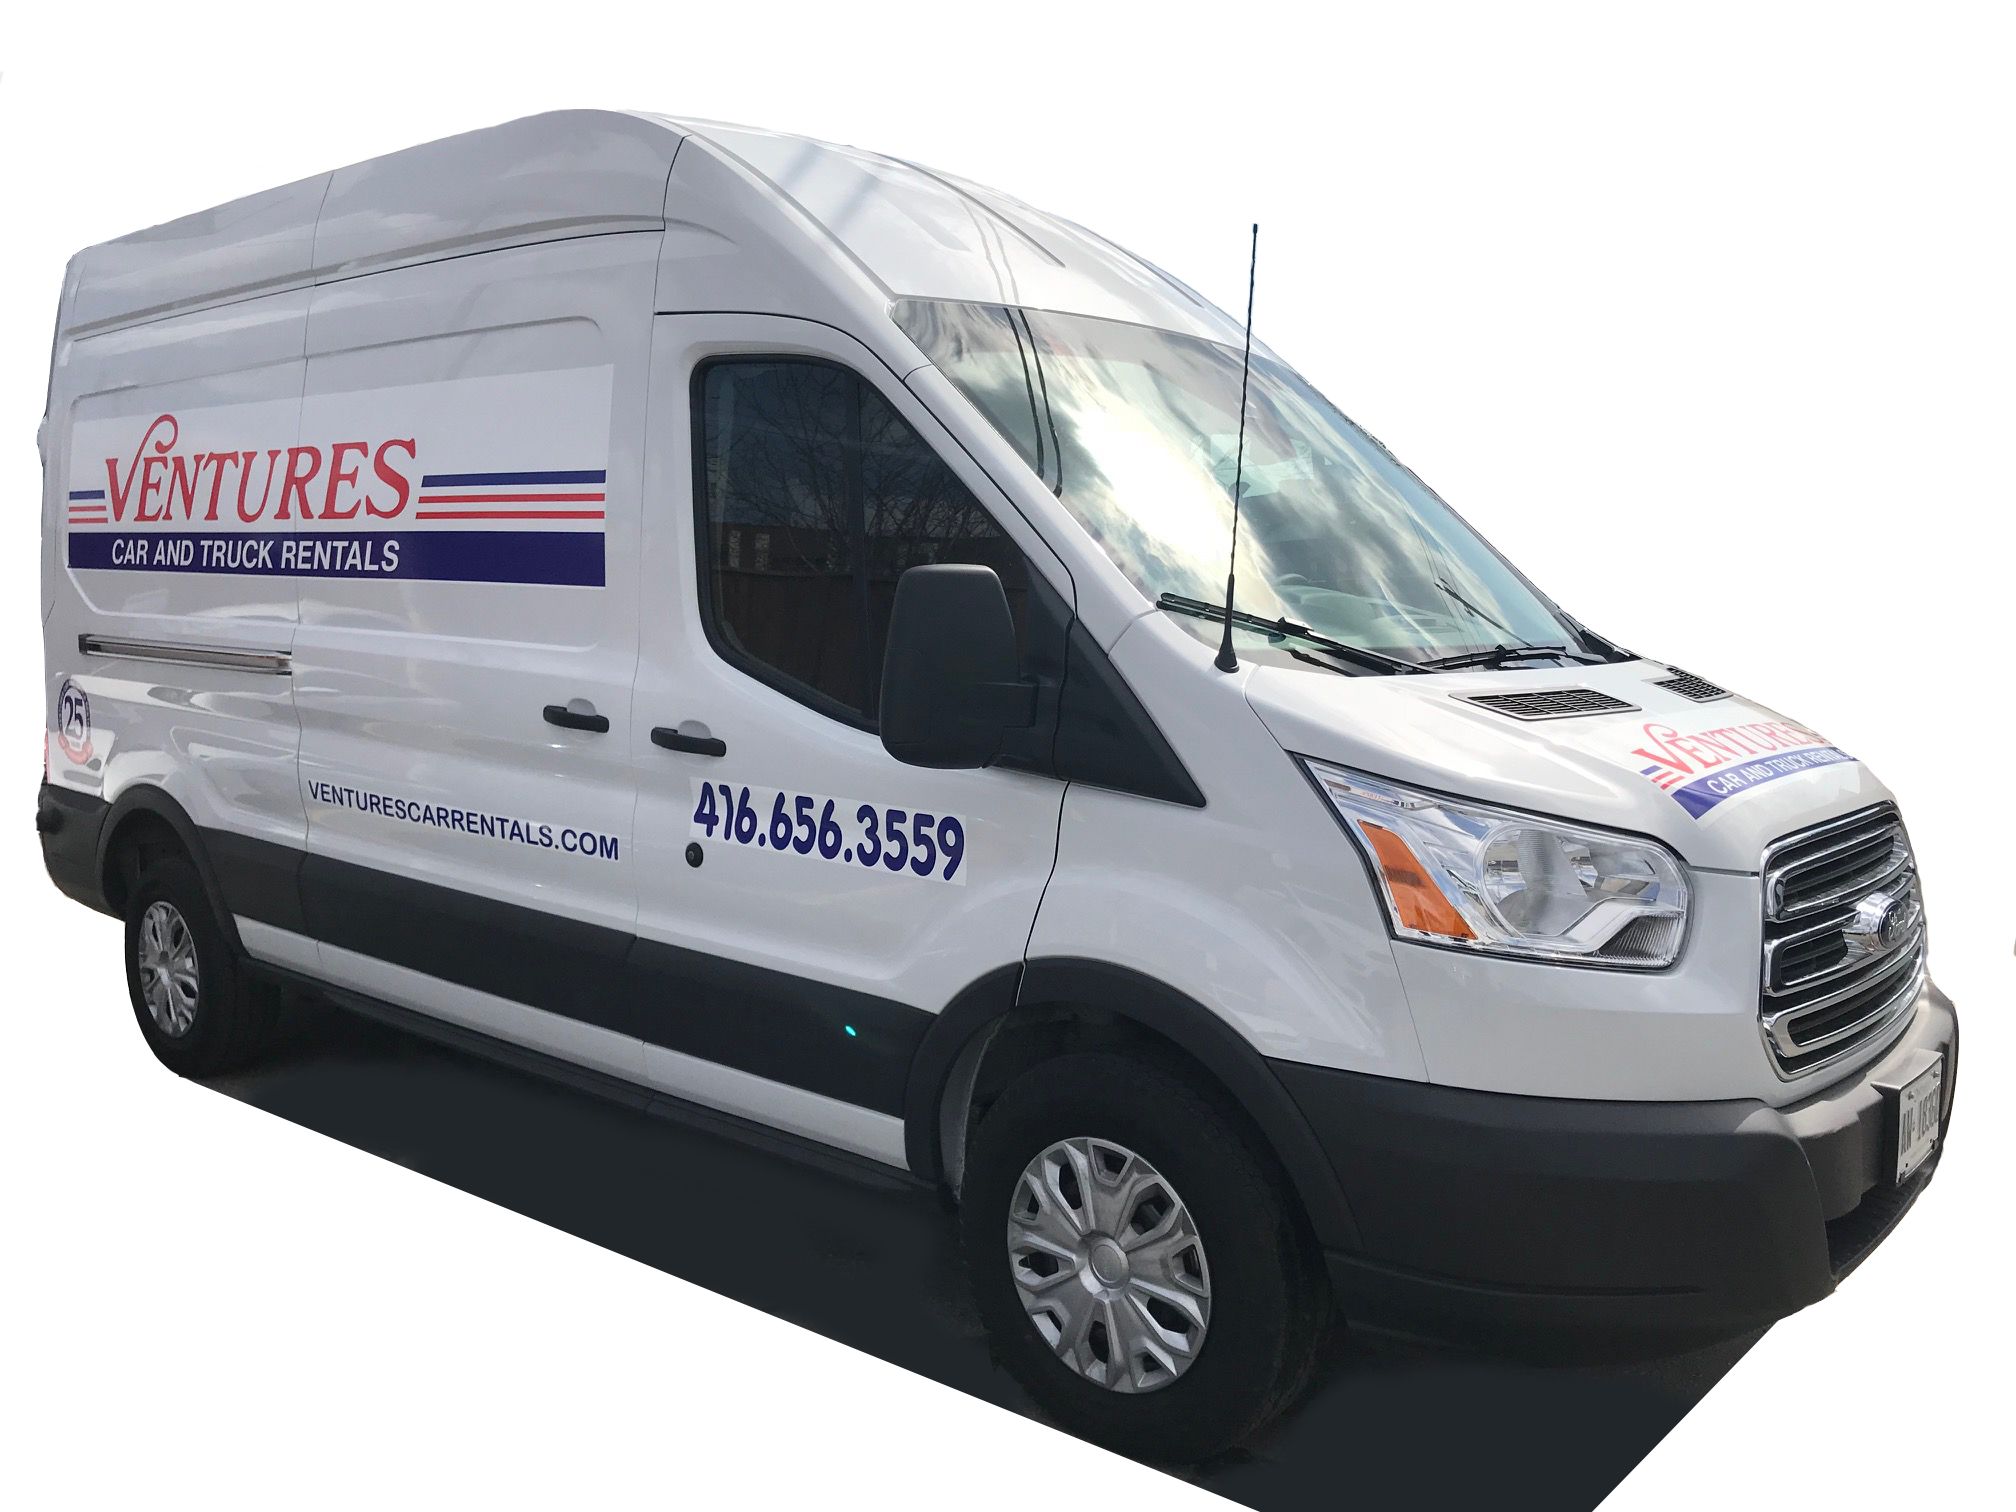 best cars & trucks in toronto- ventures car and truck rentals toronto